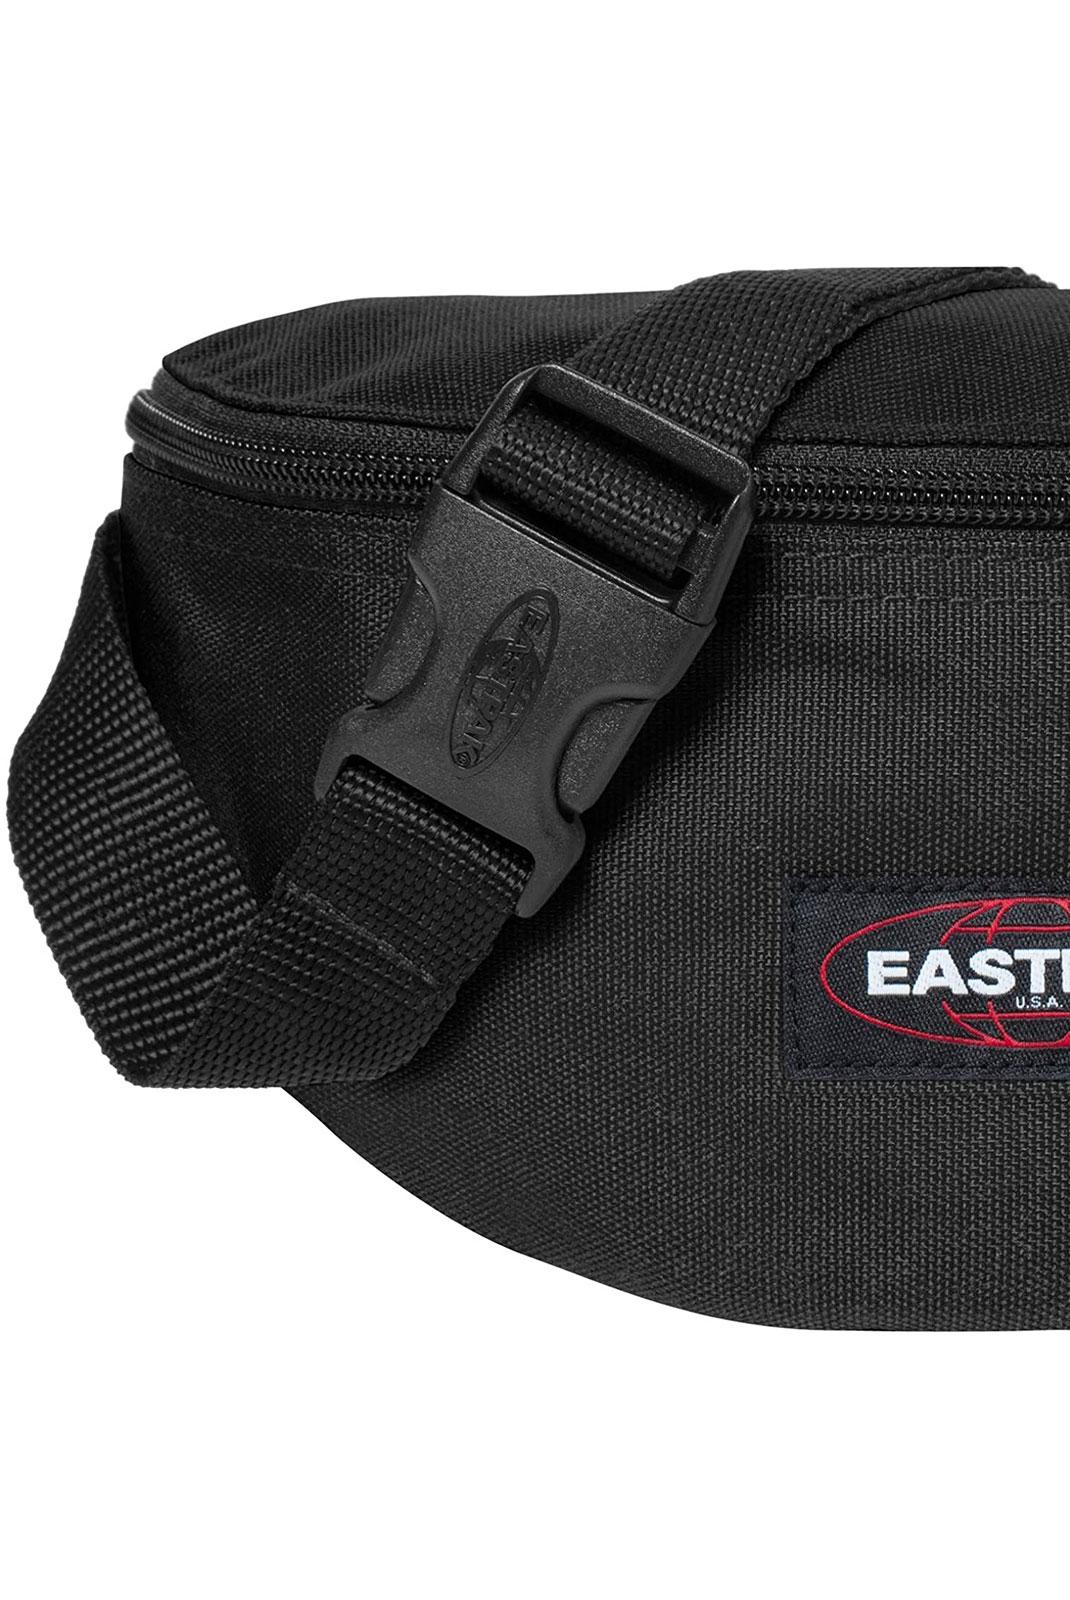 Sac porté épaule  Eastpak EK074008 SPRINGER 008 NOIR